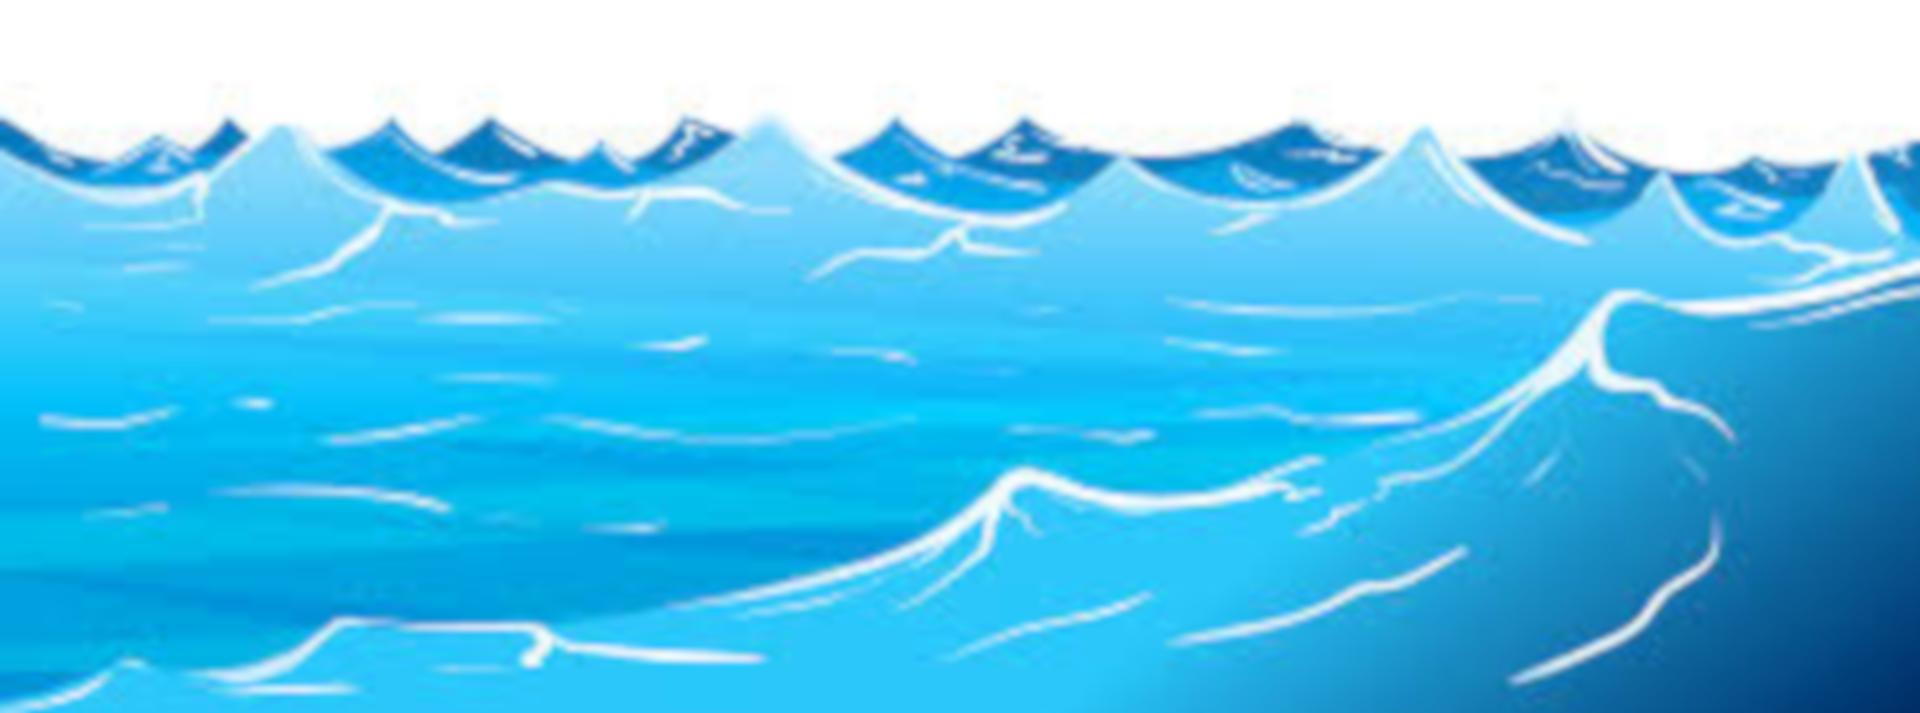 src/components/images/ocean1.png